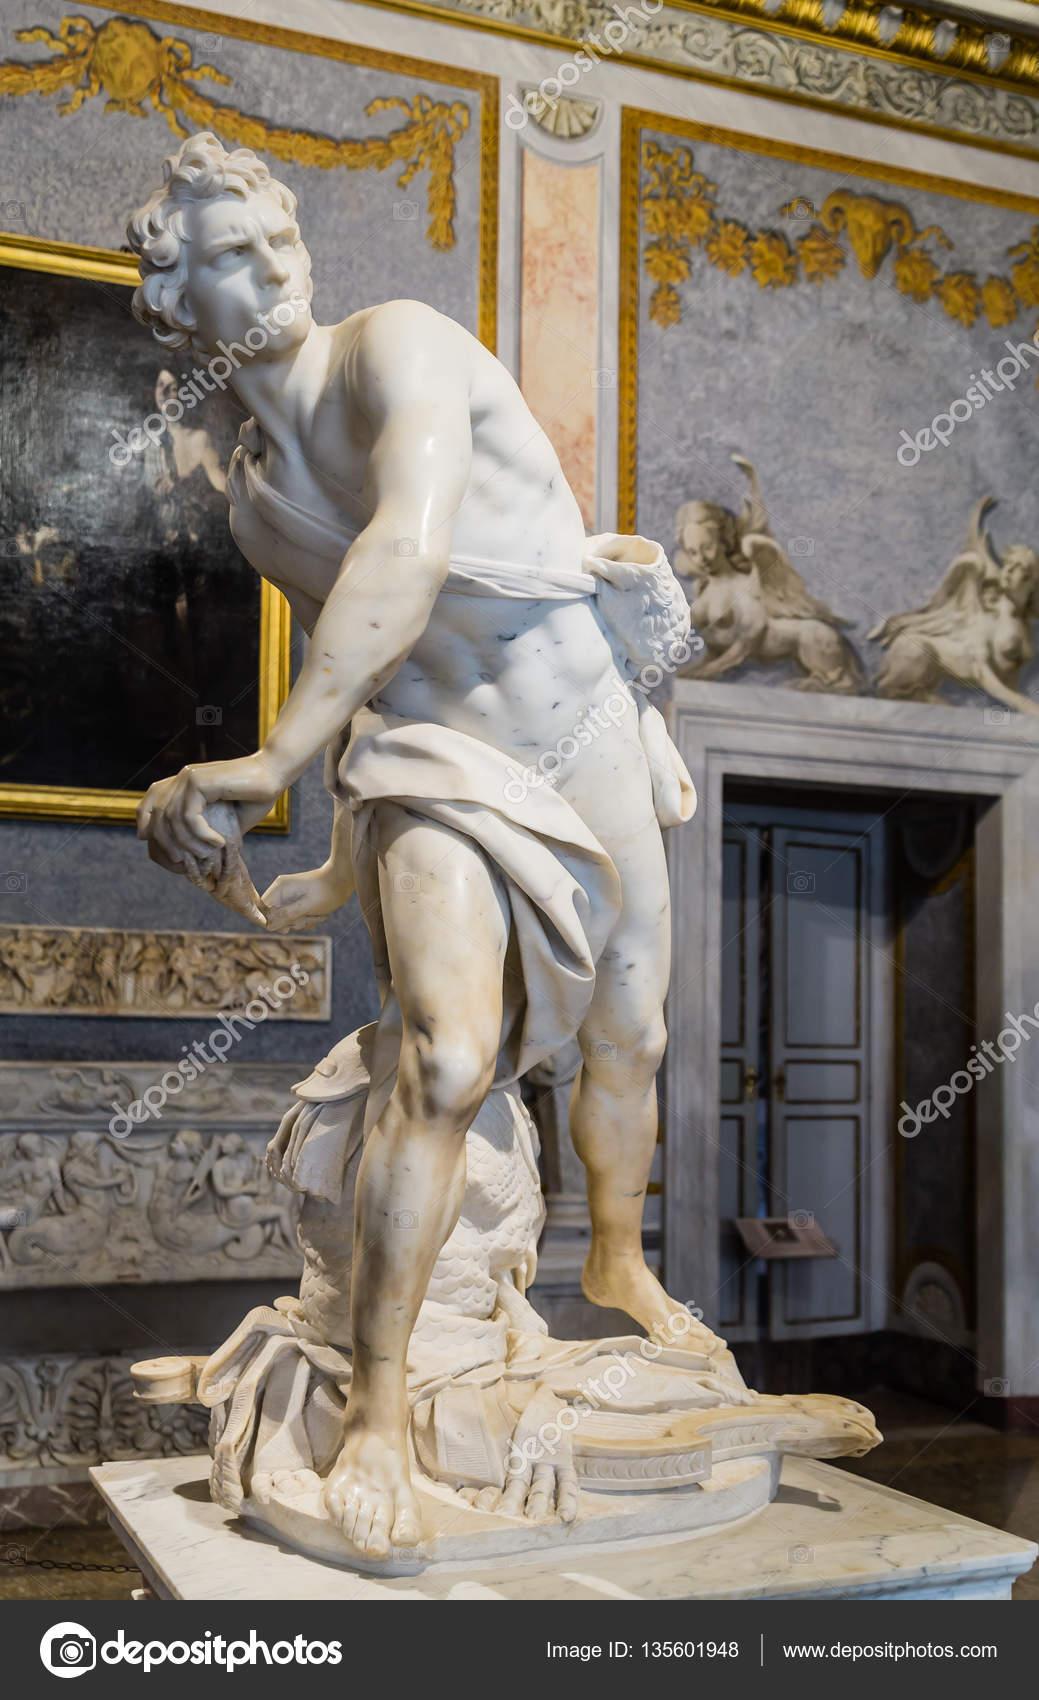 Marble sculpture David by Gian Lorenzo Bernini in Galleria